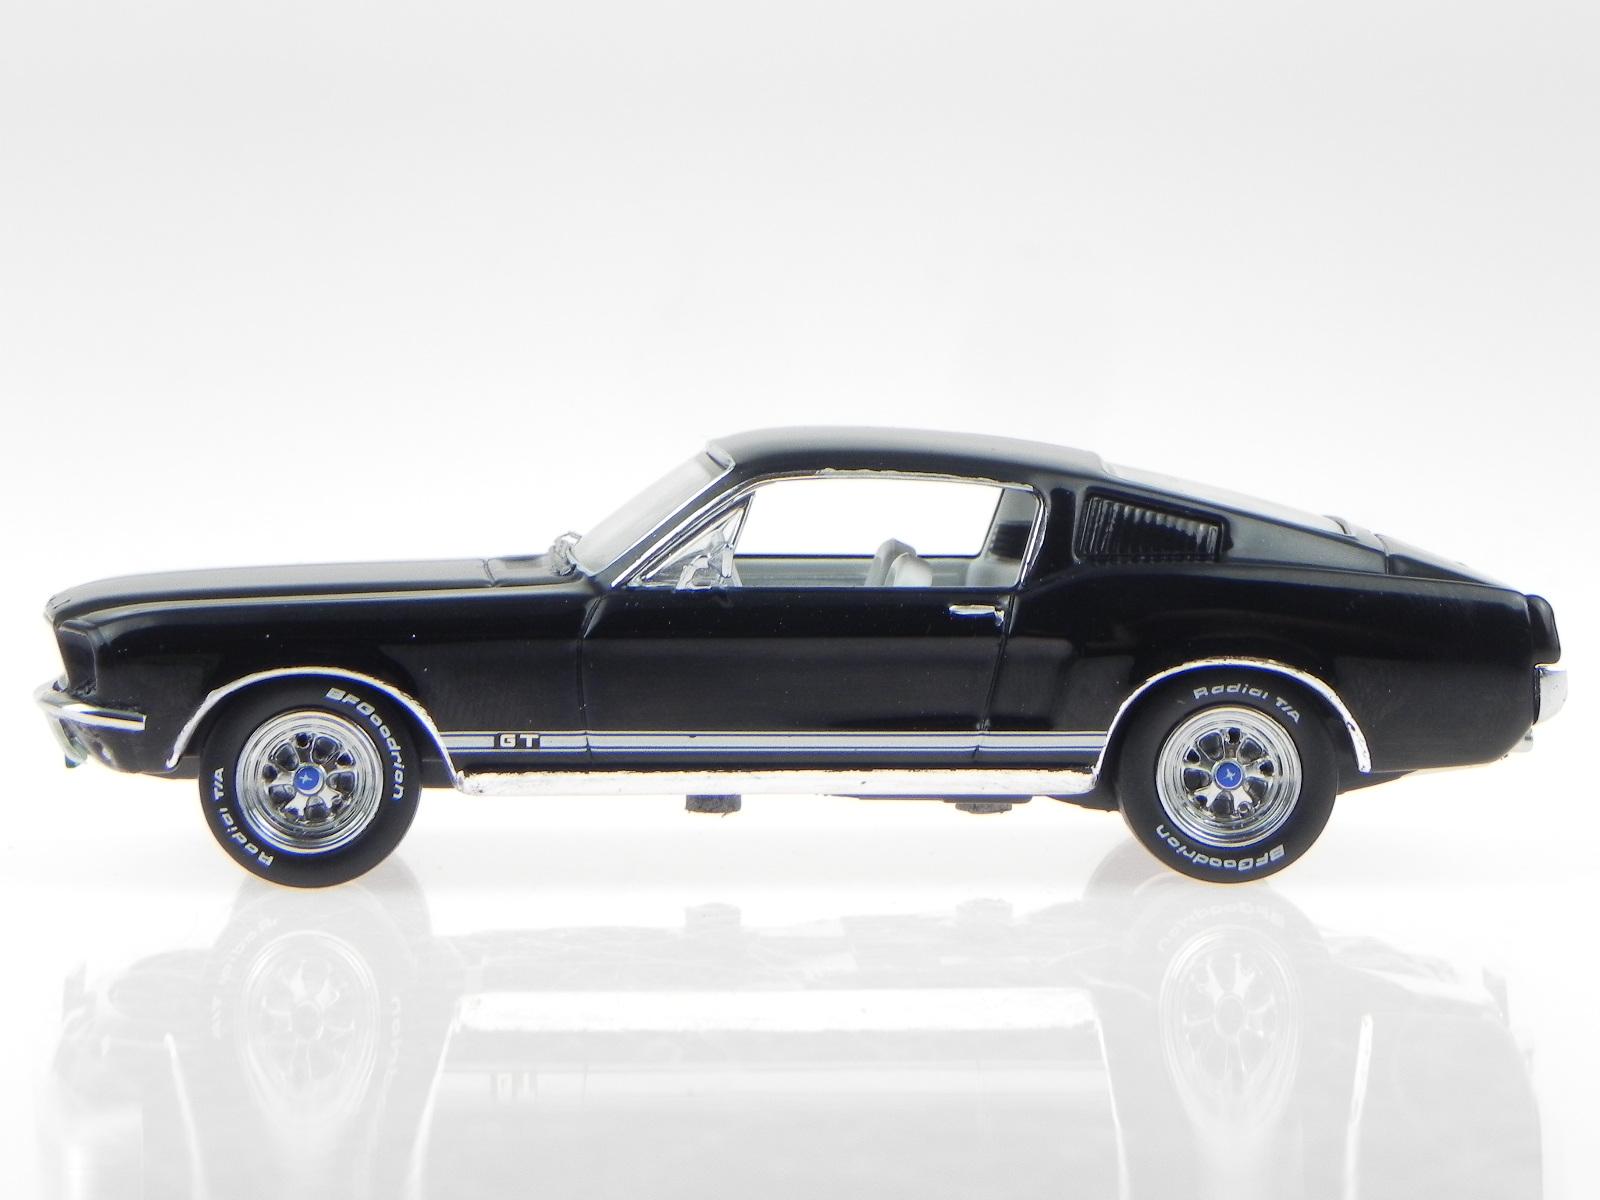 ford mustang gt fastback 1967 schwarz modellauto prd366. Black Bedroom Furniture Sets. Home Design Ideas